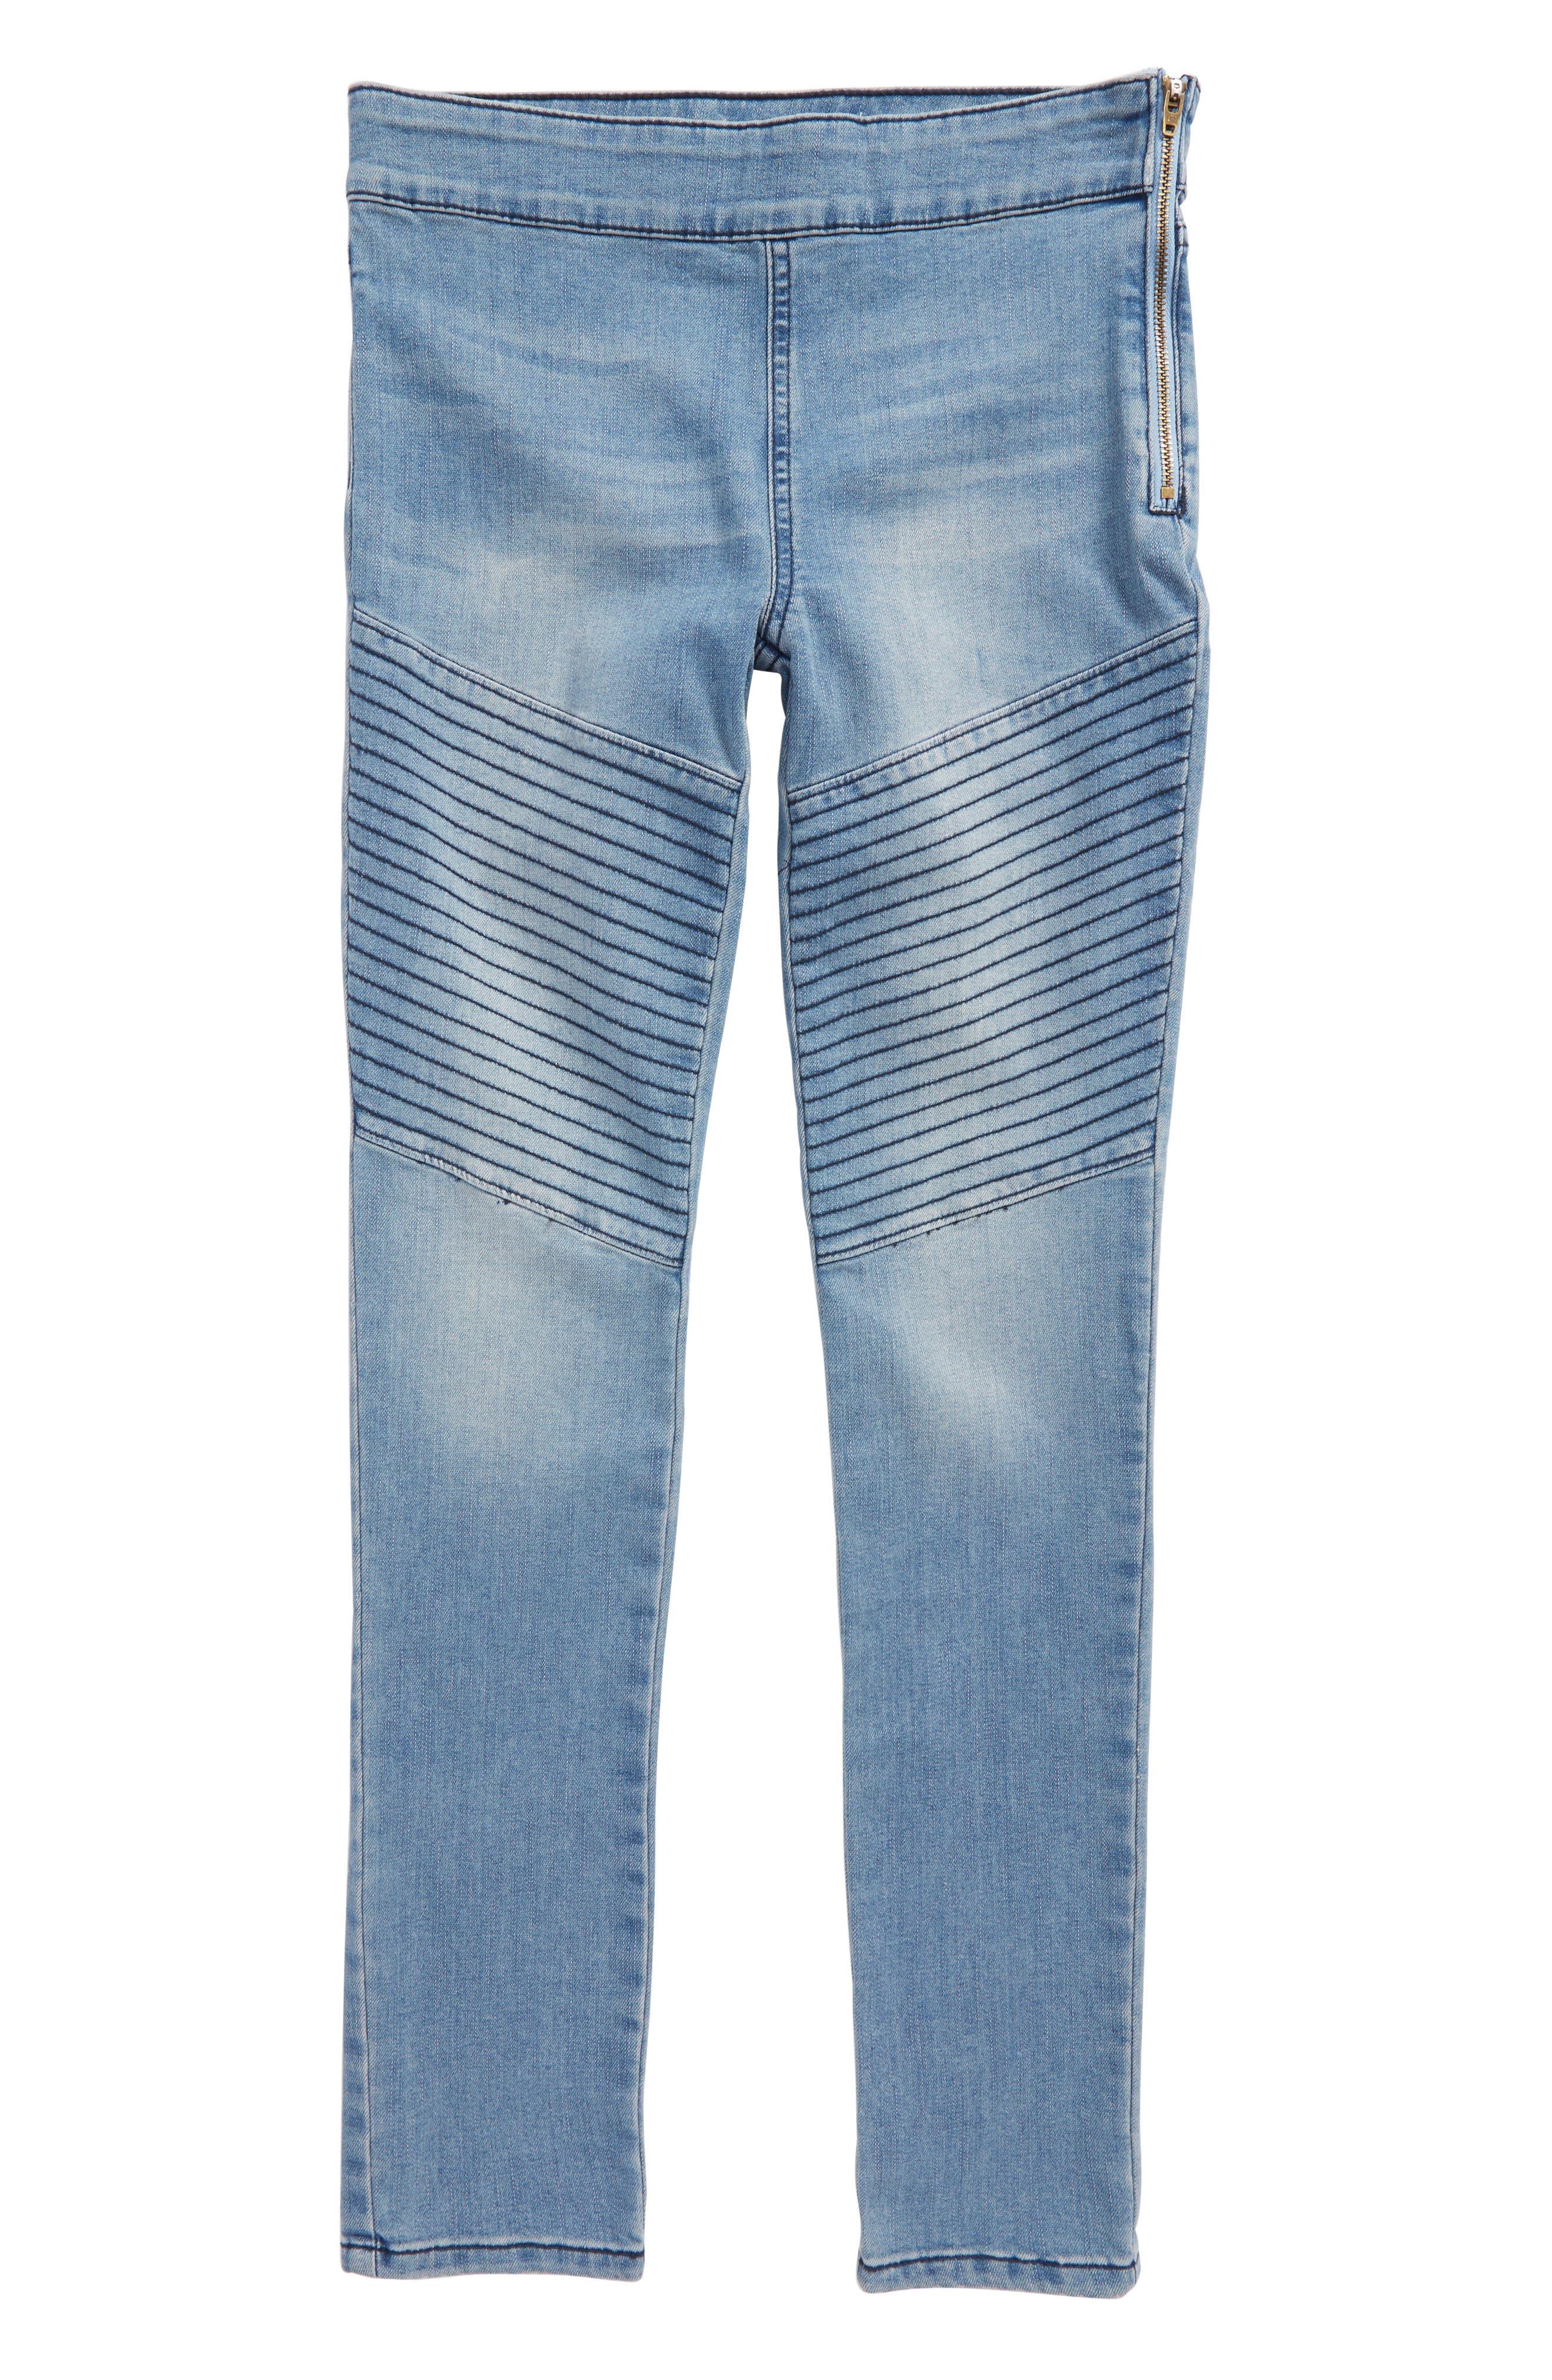 Denim Moto Leggings,                         Main,                         color, Blue Bird Wash